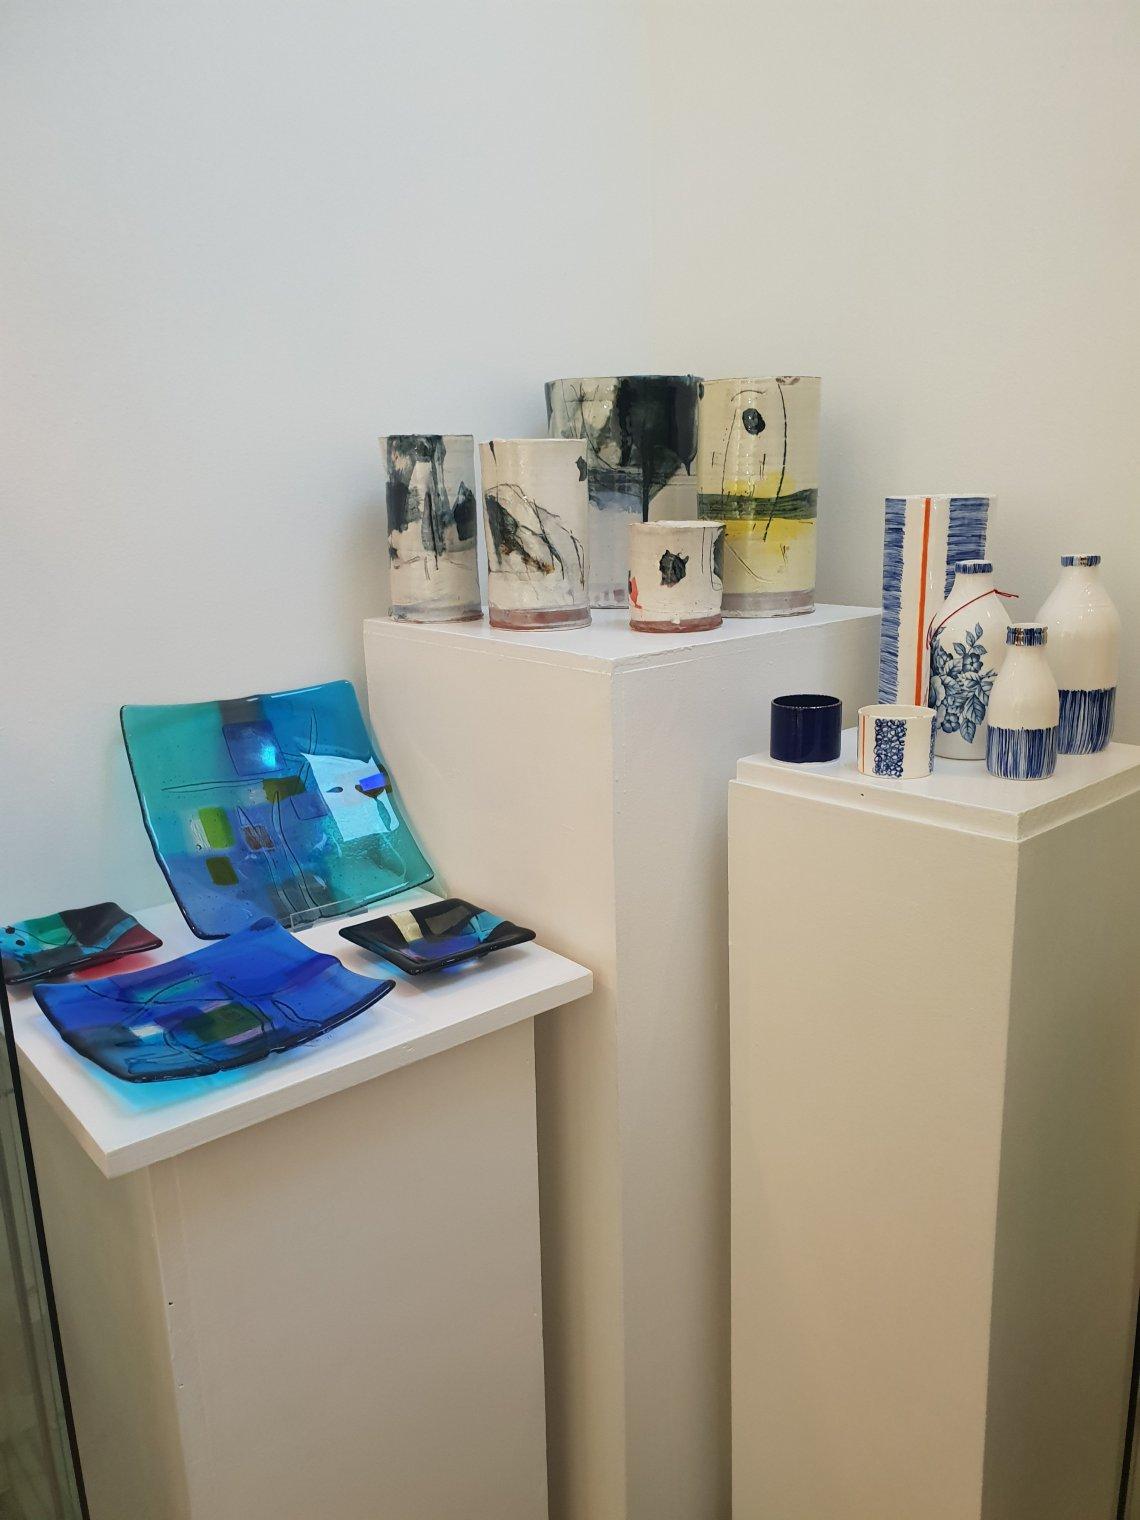 A display of ceramic sculptures and pots at Sara Preisler, Birmingham.